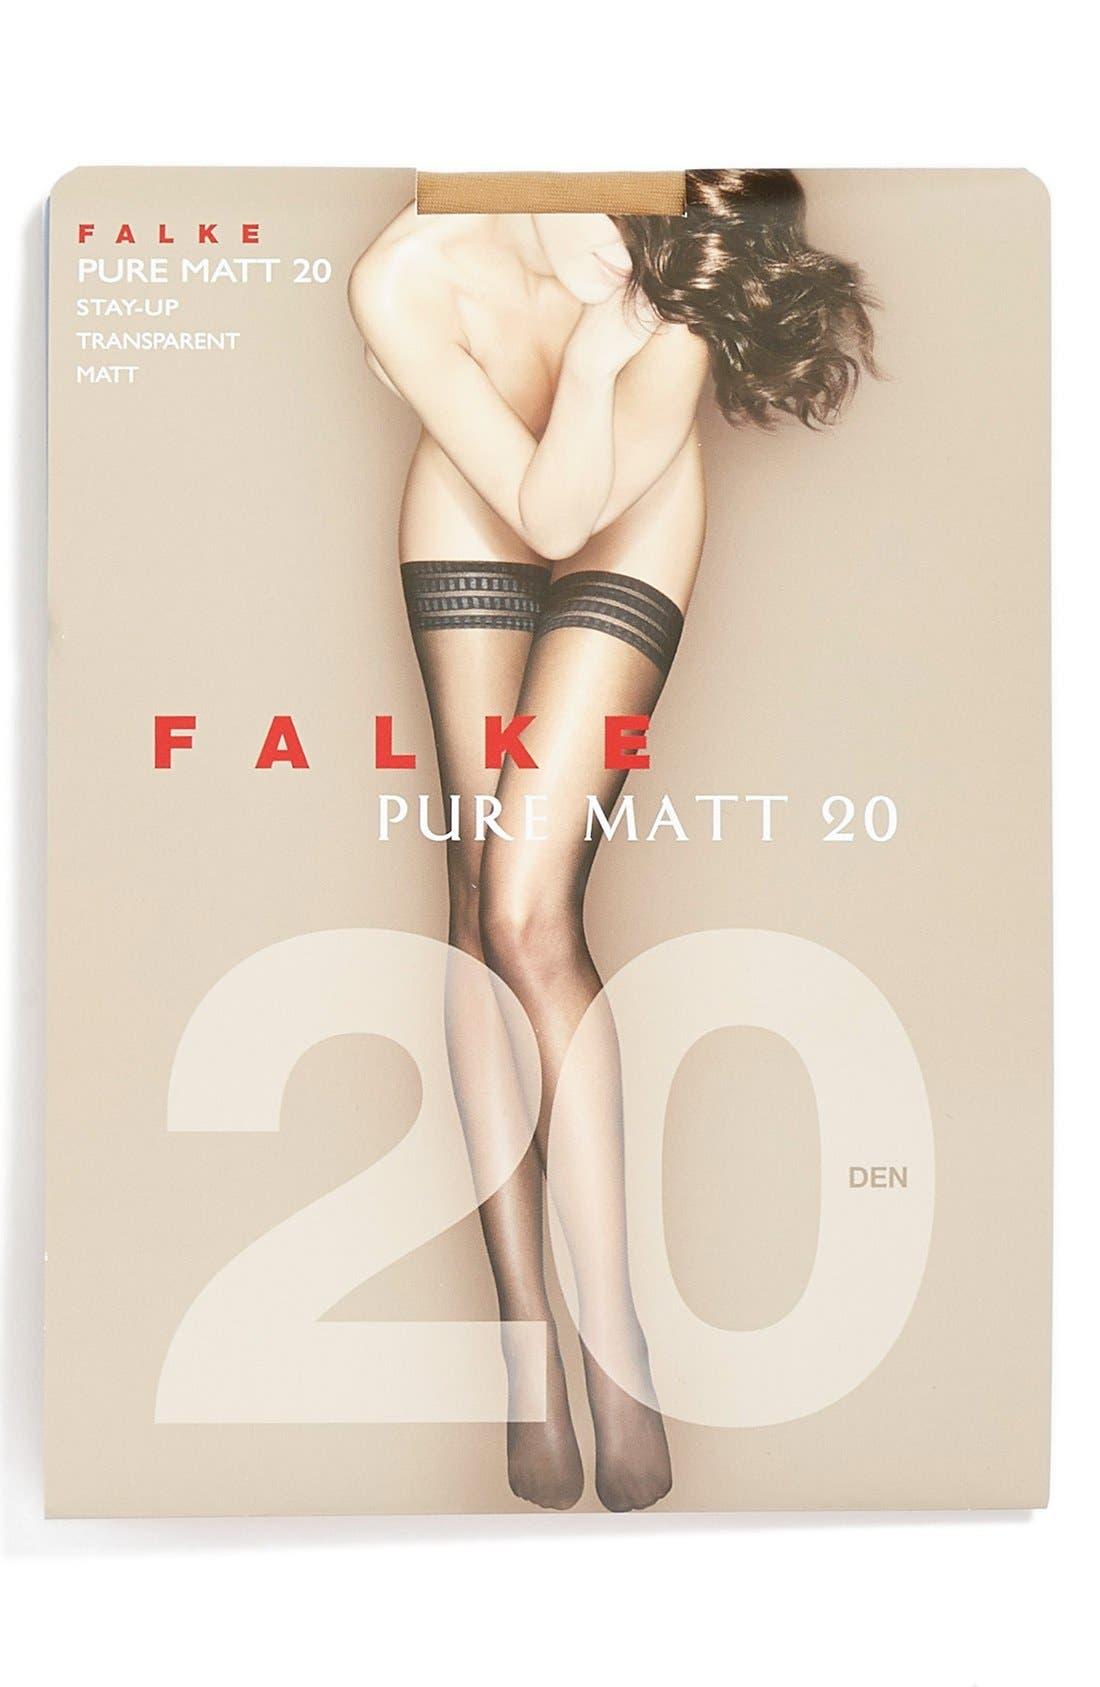 'Pure Matt 20' Stay-Up Stockings,                             Alternate thumbnail 2, color,                             Golden